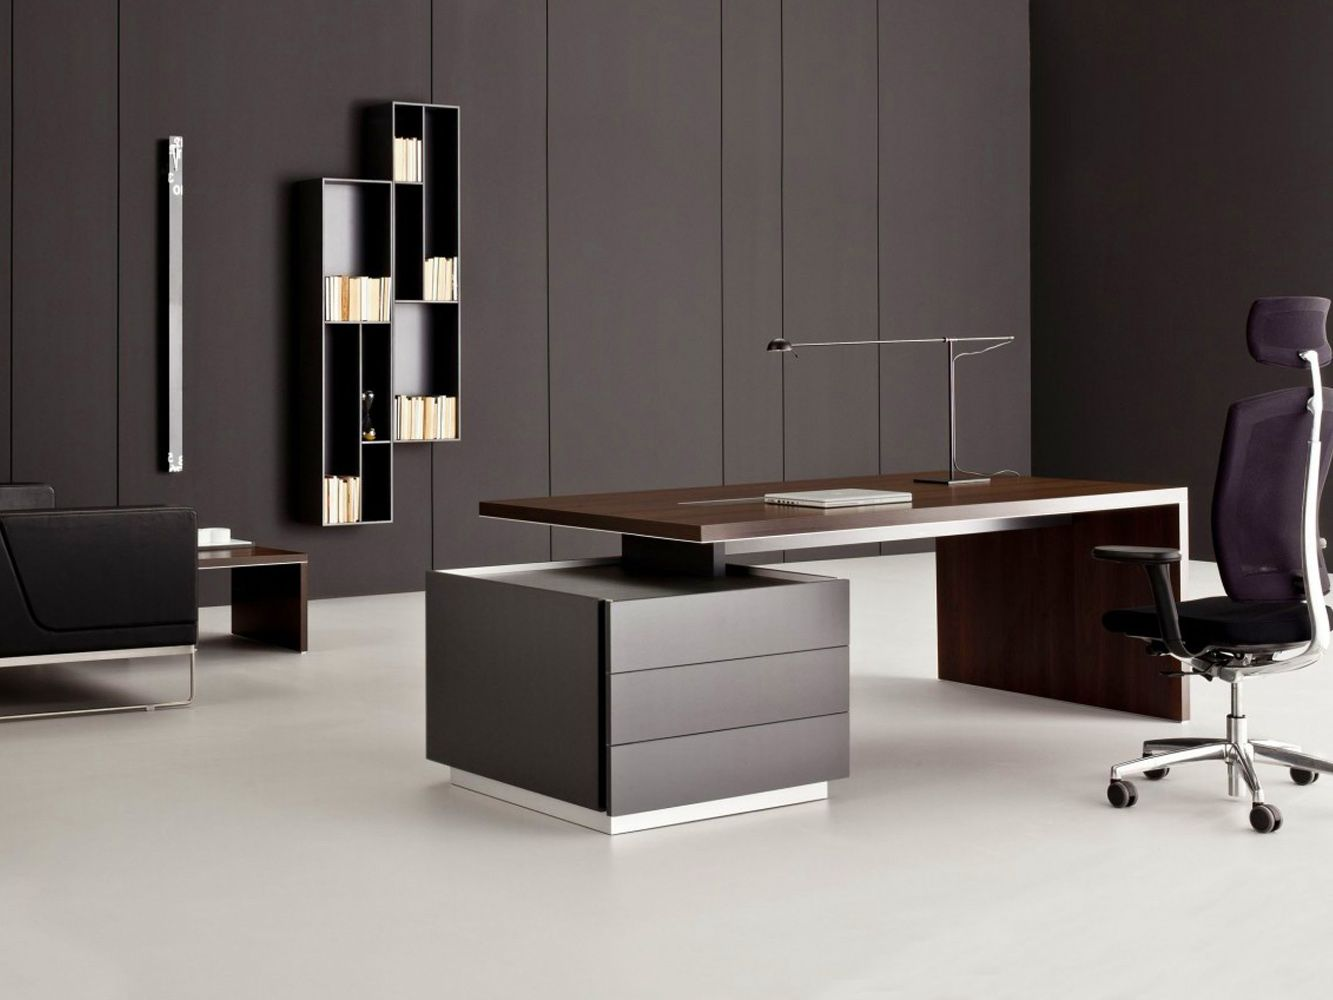 High End Modern Furniture: Modern Executive High End Office Furniture Ideas Wallpaper